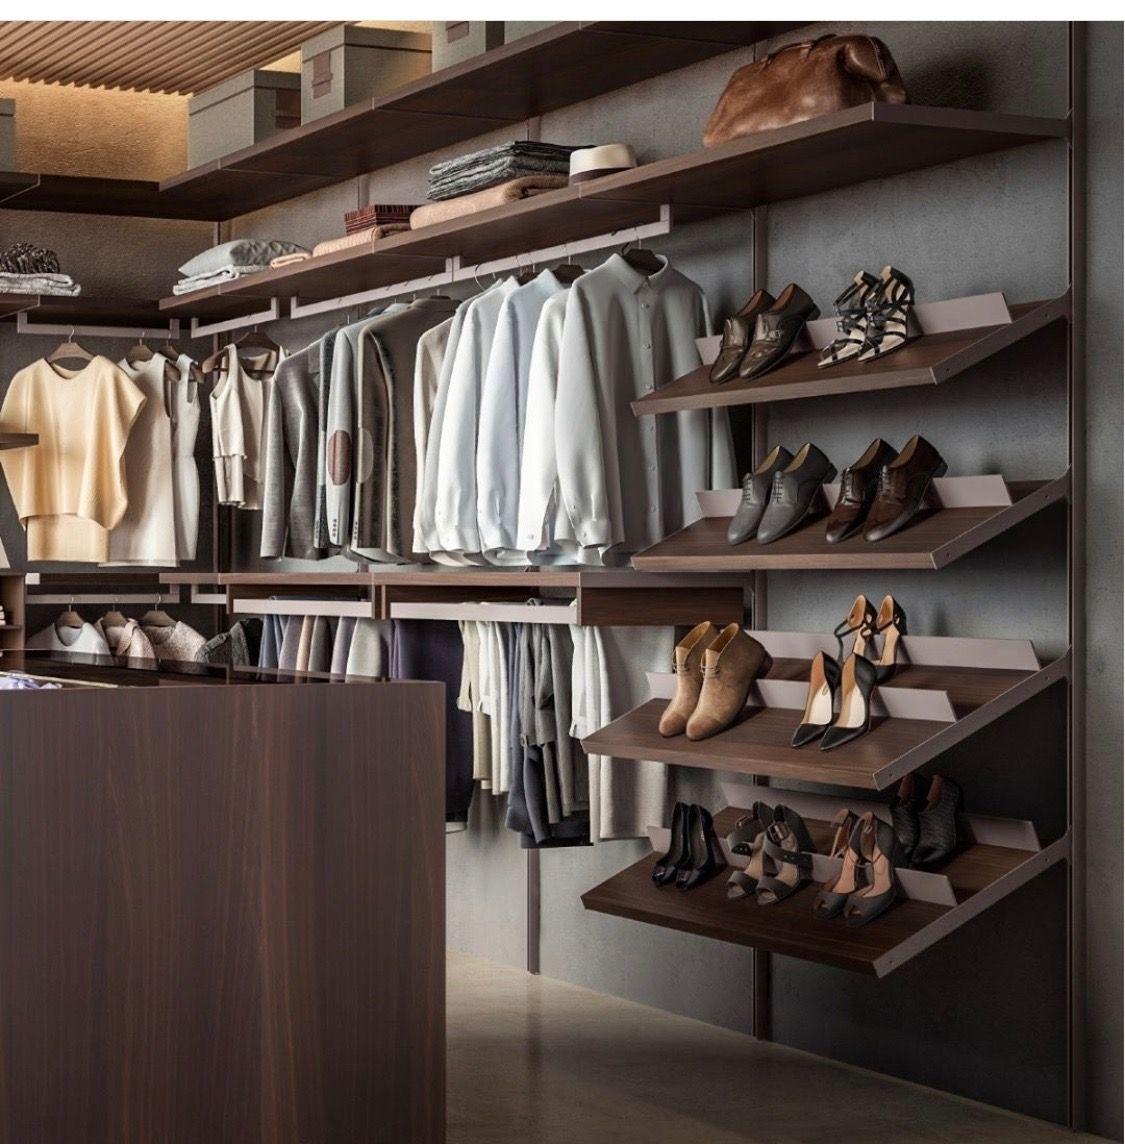 Pin by Gl L on Scarpiera | Walk in closet, Shoe rack, Drawers